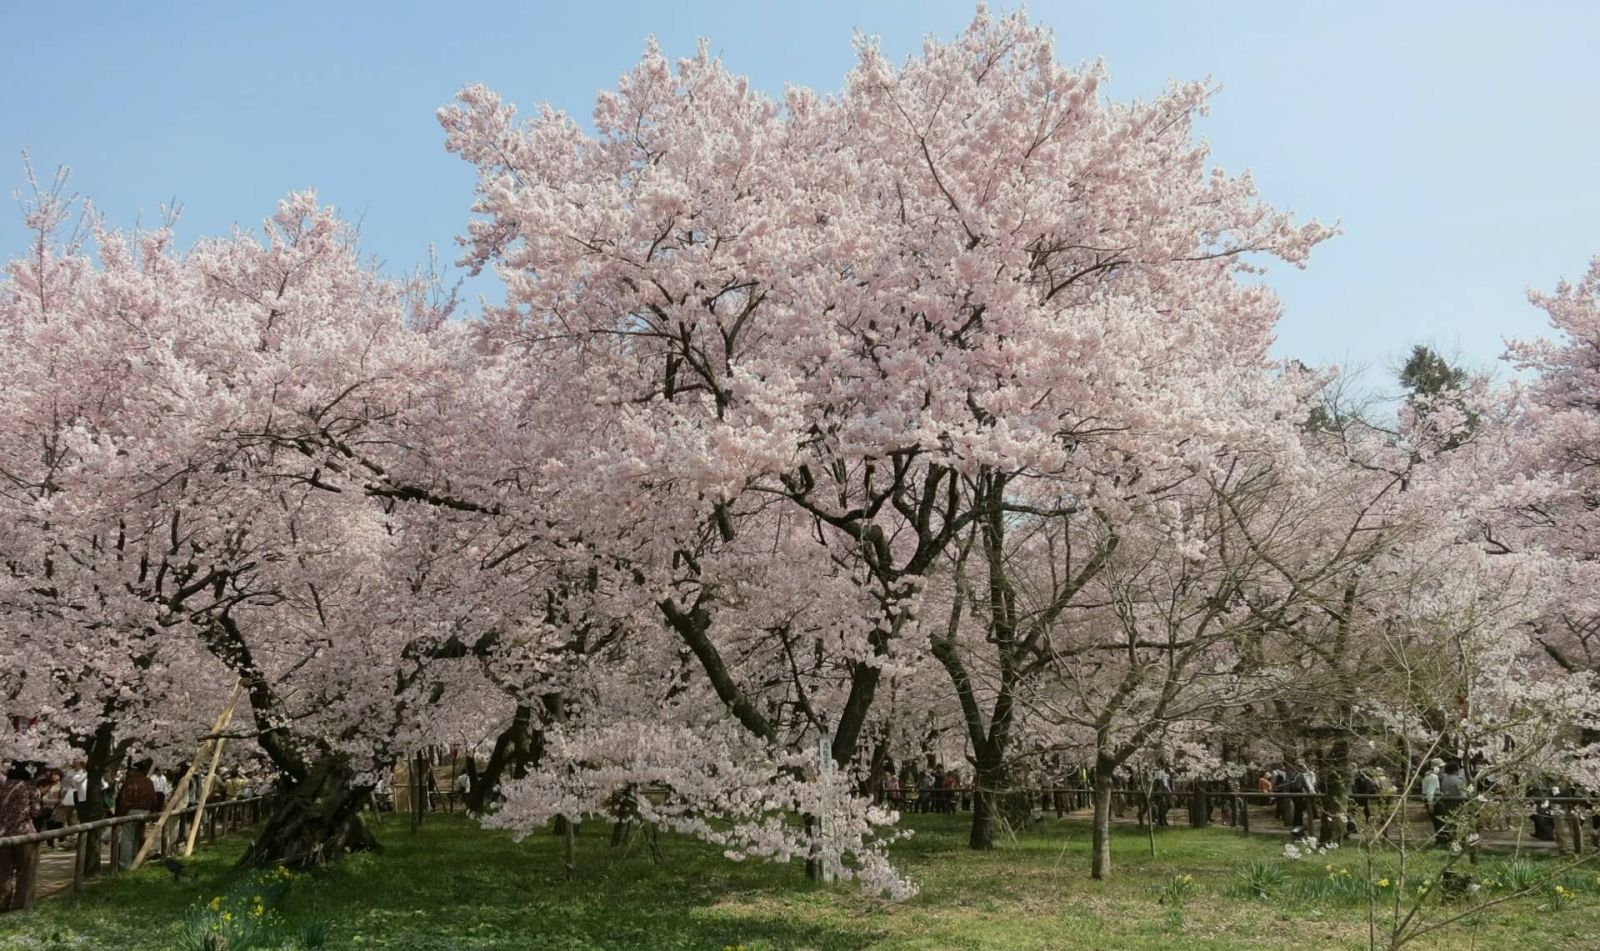 takato-castle-park-cherry-blossom